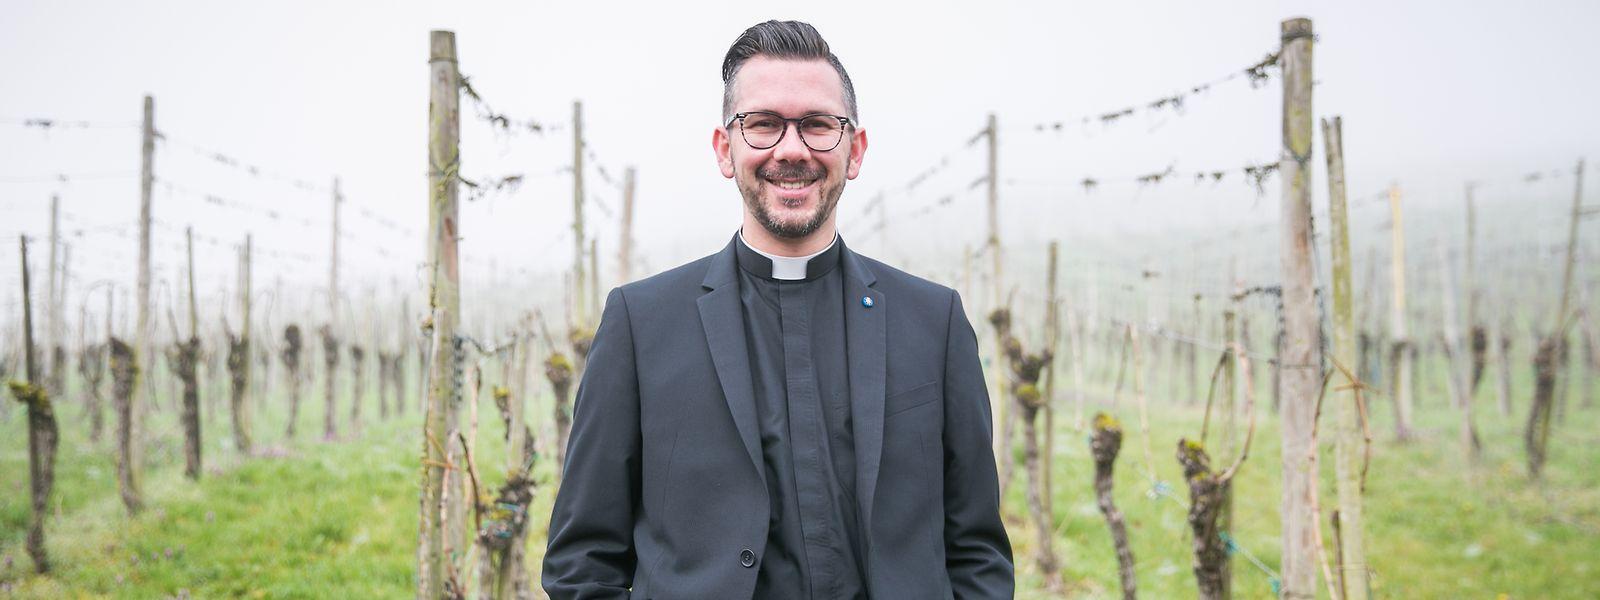 Daniel Graul, Pfarrmoderator der Pfarrei Dräilännereck Musel a Garner St. Nicolas.